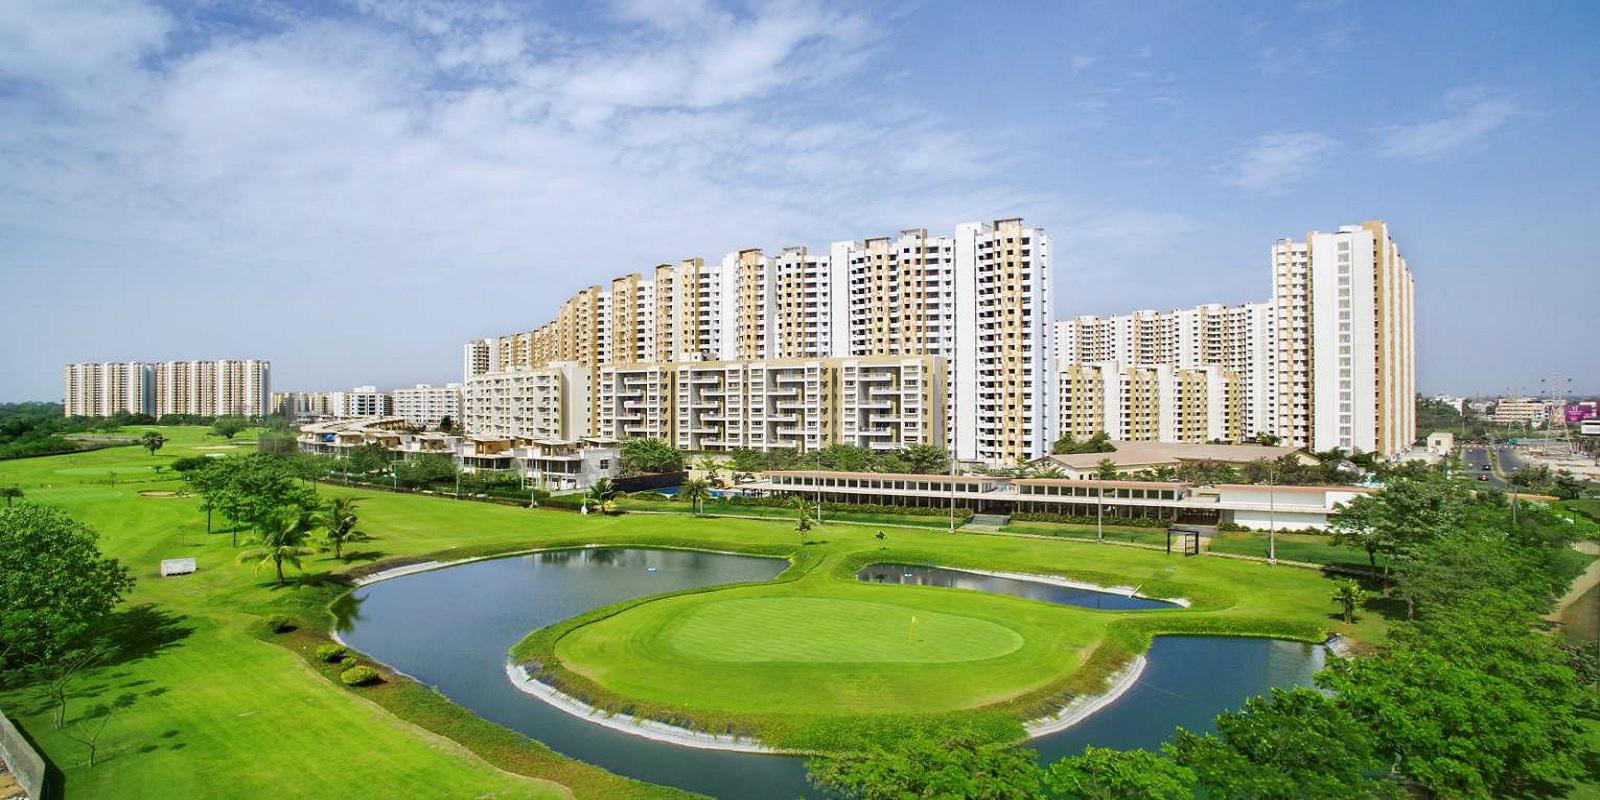 lodha centre park project large image2